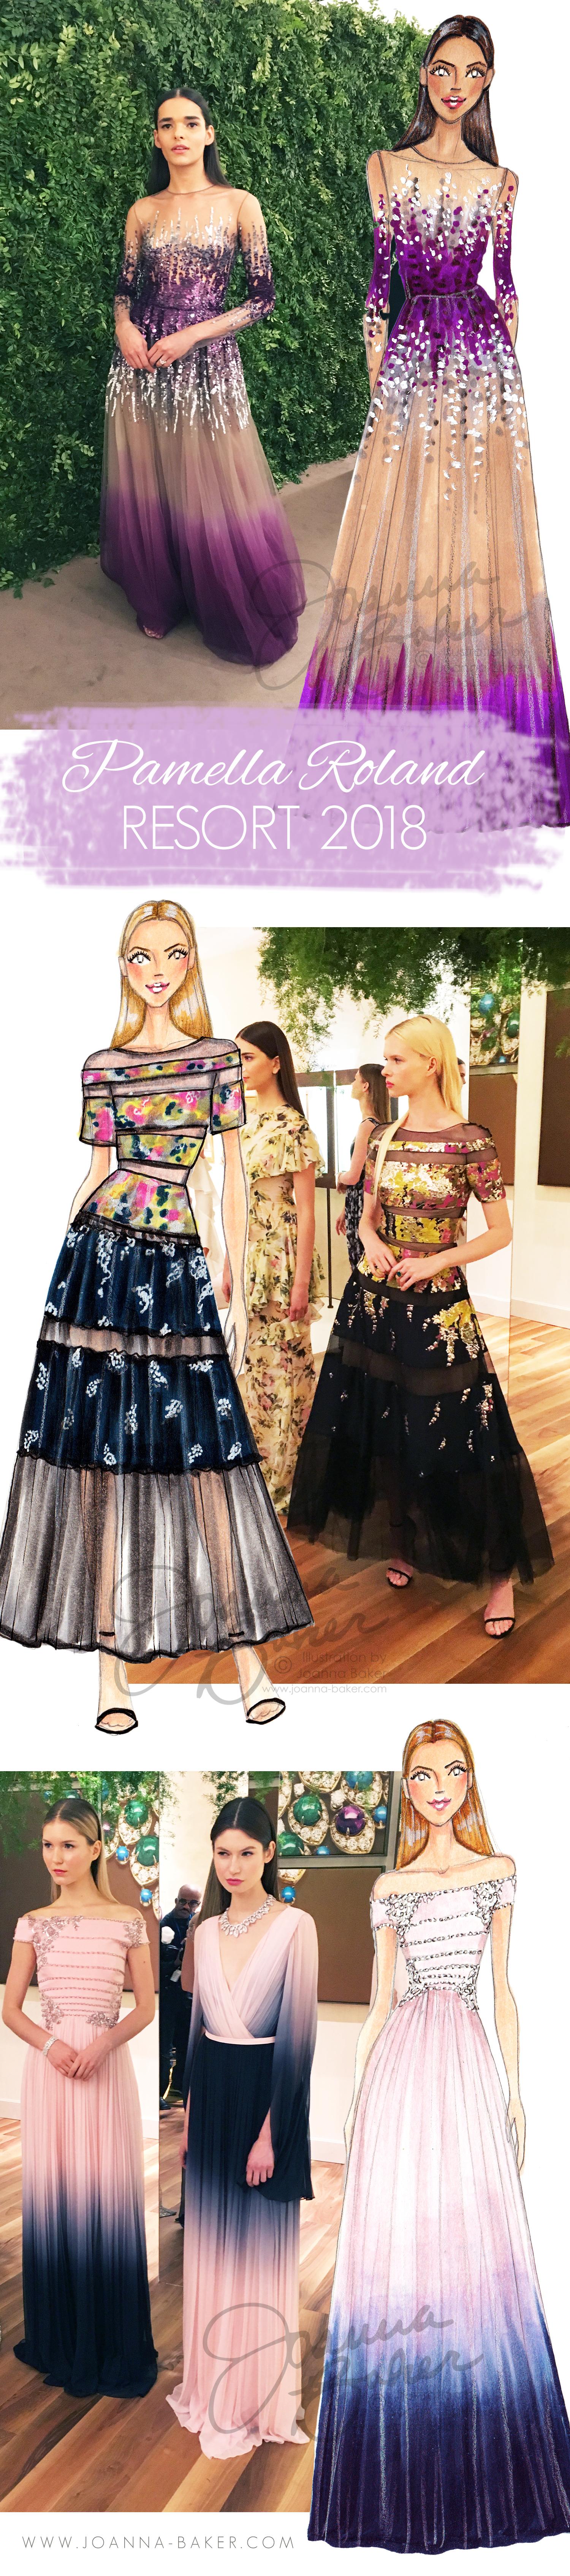 Pamella Roland Resort 2018 Fashion Illustrations by Joanna Baker